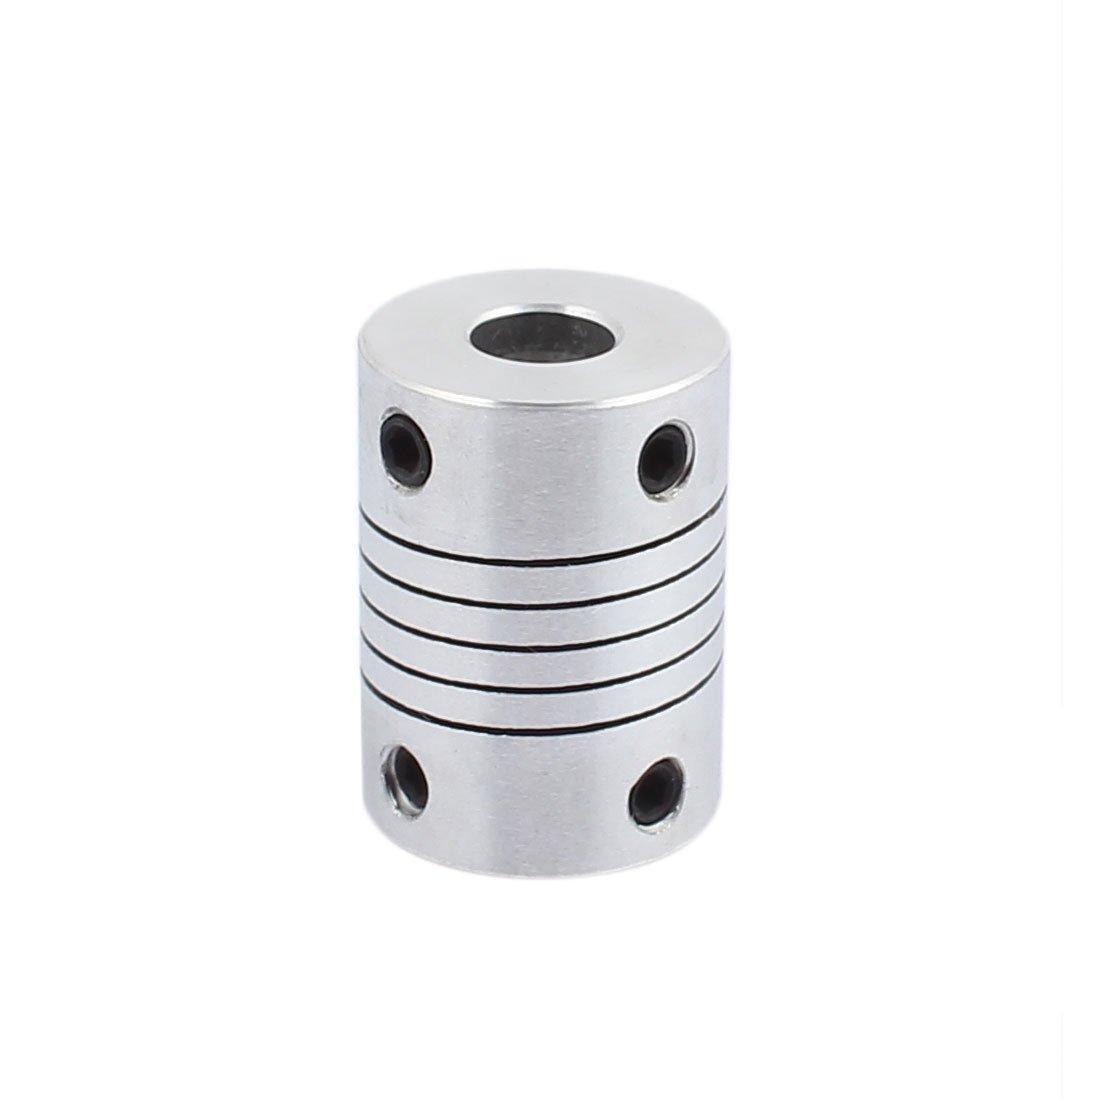 uxcell 14mm to 14mm Shaft Coupling 45mm Length 32mm Diameter Coupler Aluminum Alloy Joint Motor for 3D Printer CNC Machine DIY Encoder